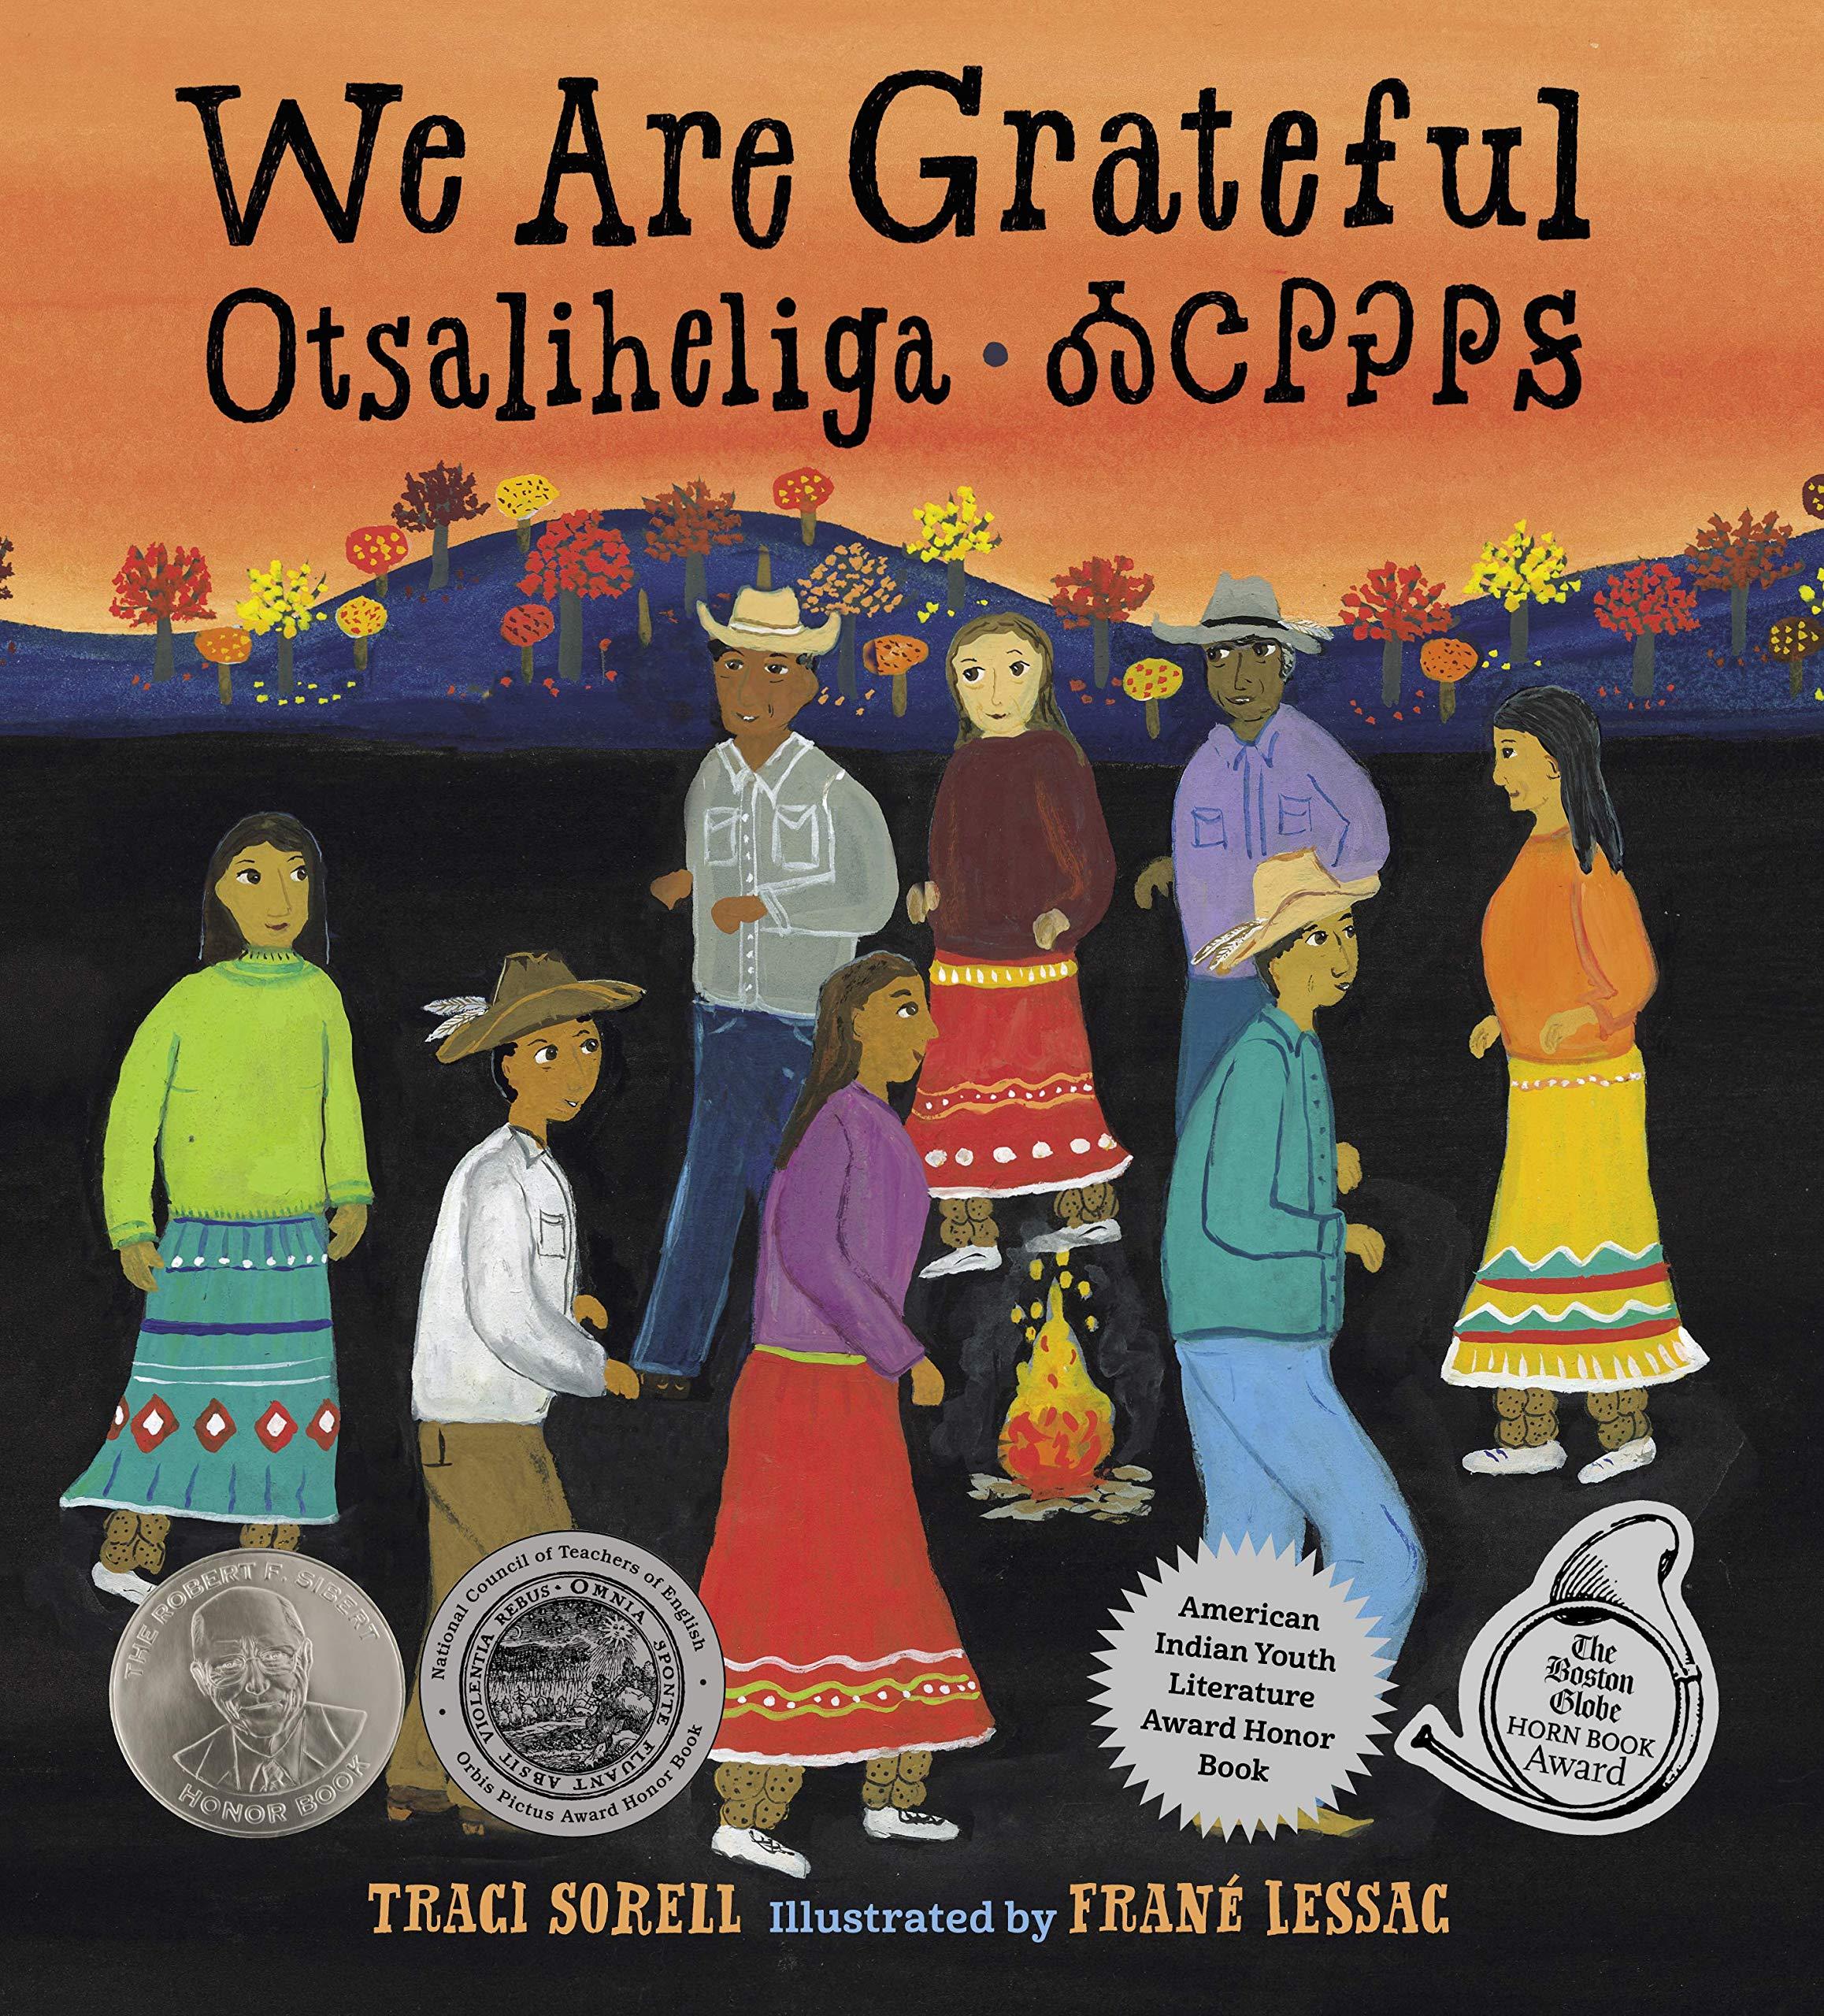 Amazon.com: We Are Grateful: Otsaliheliga (9781580897723): Sorell, Traci,  Lessac, Frane: Books